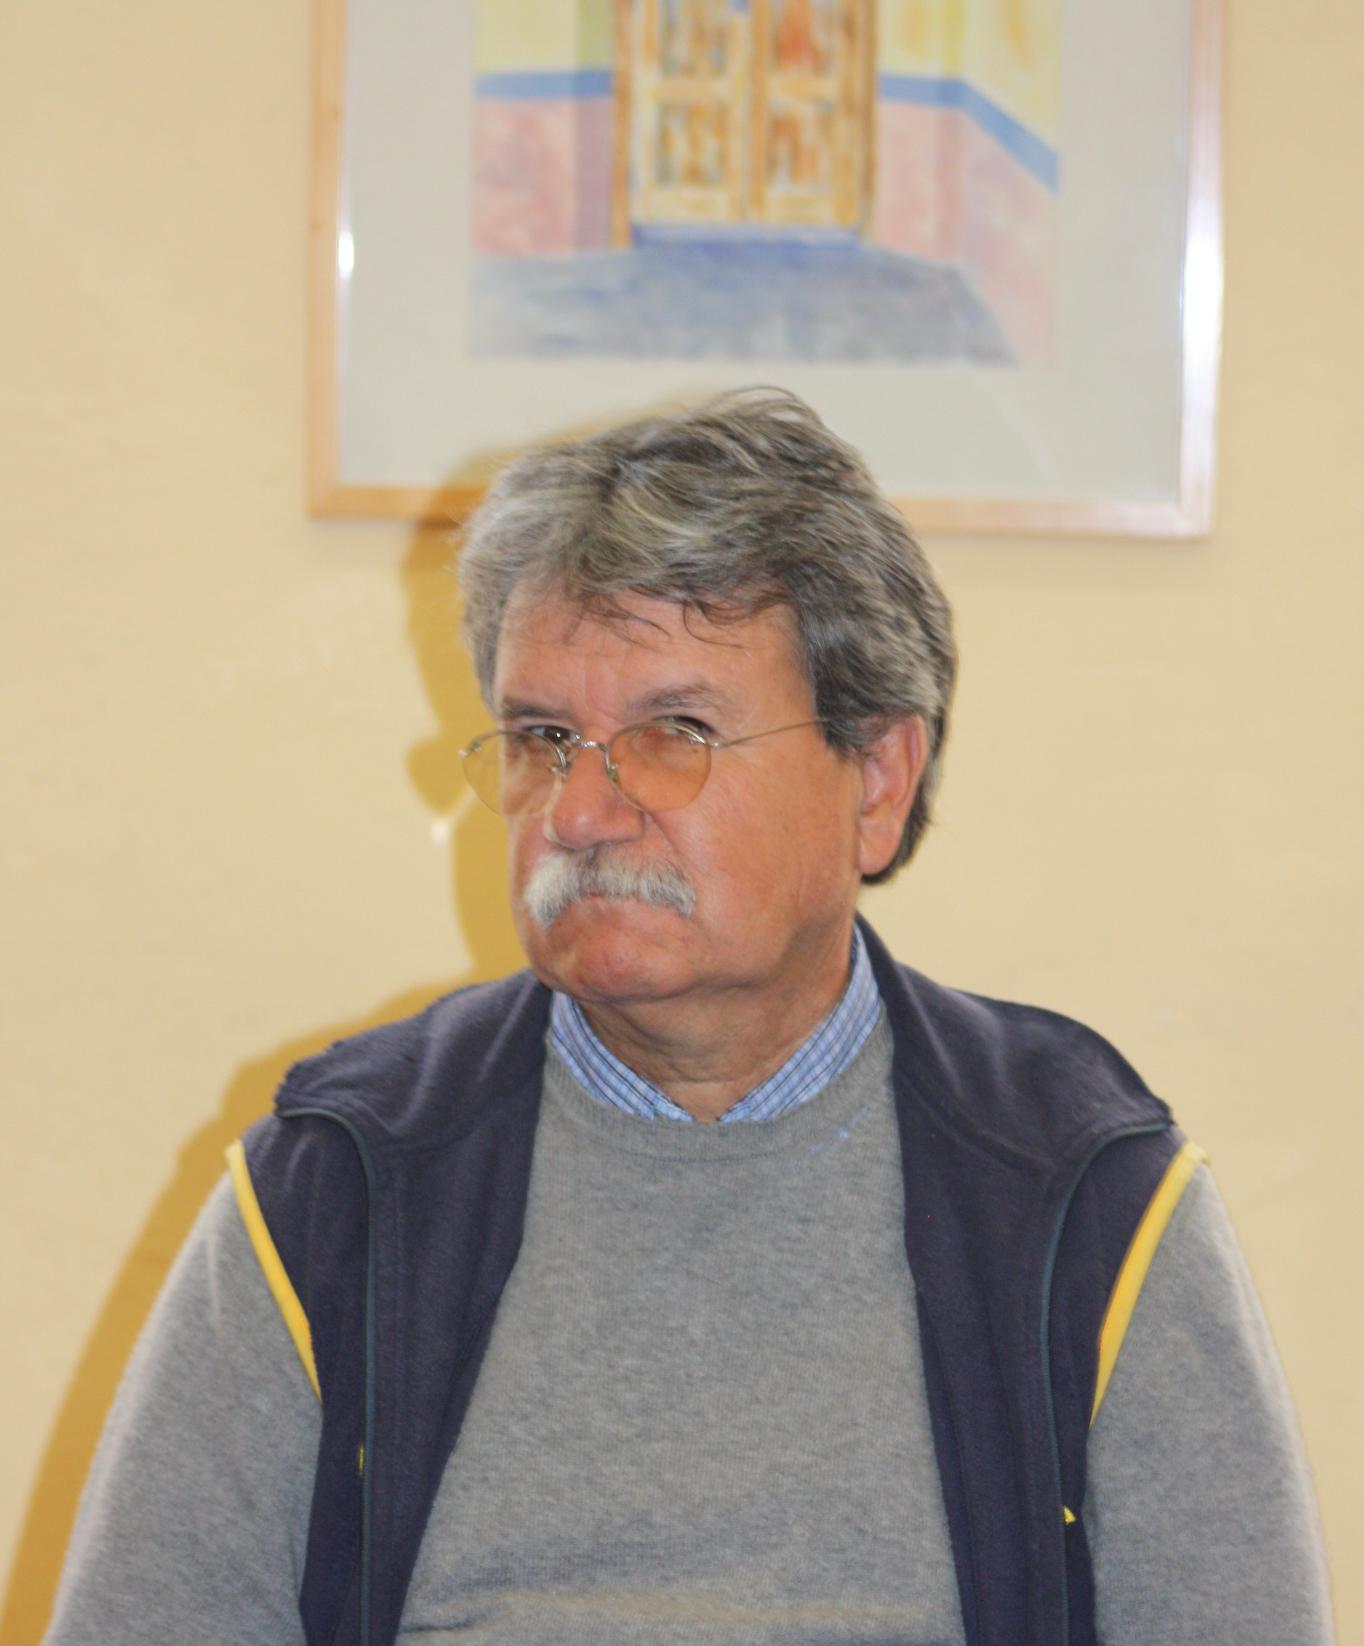 Luis Alberto Martínez